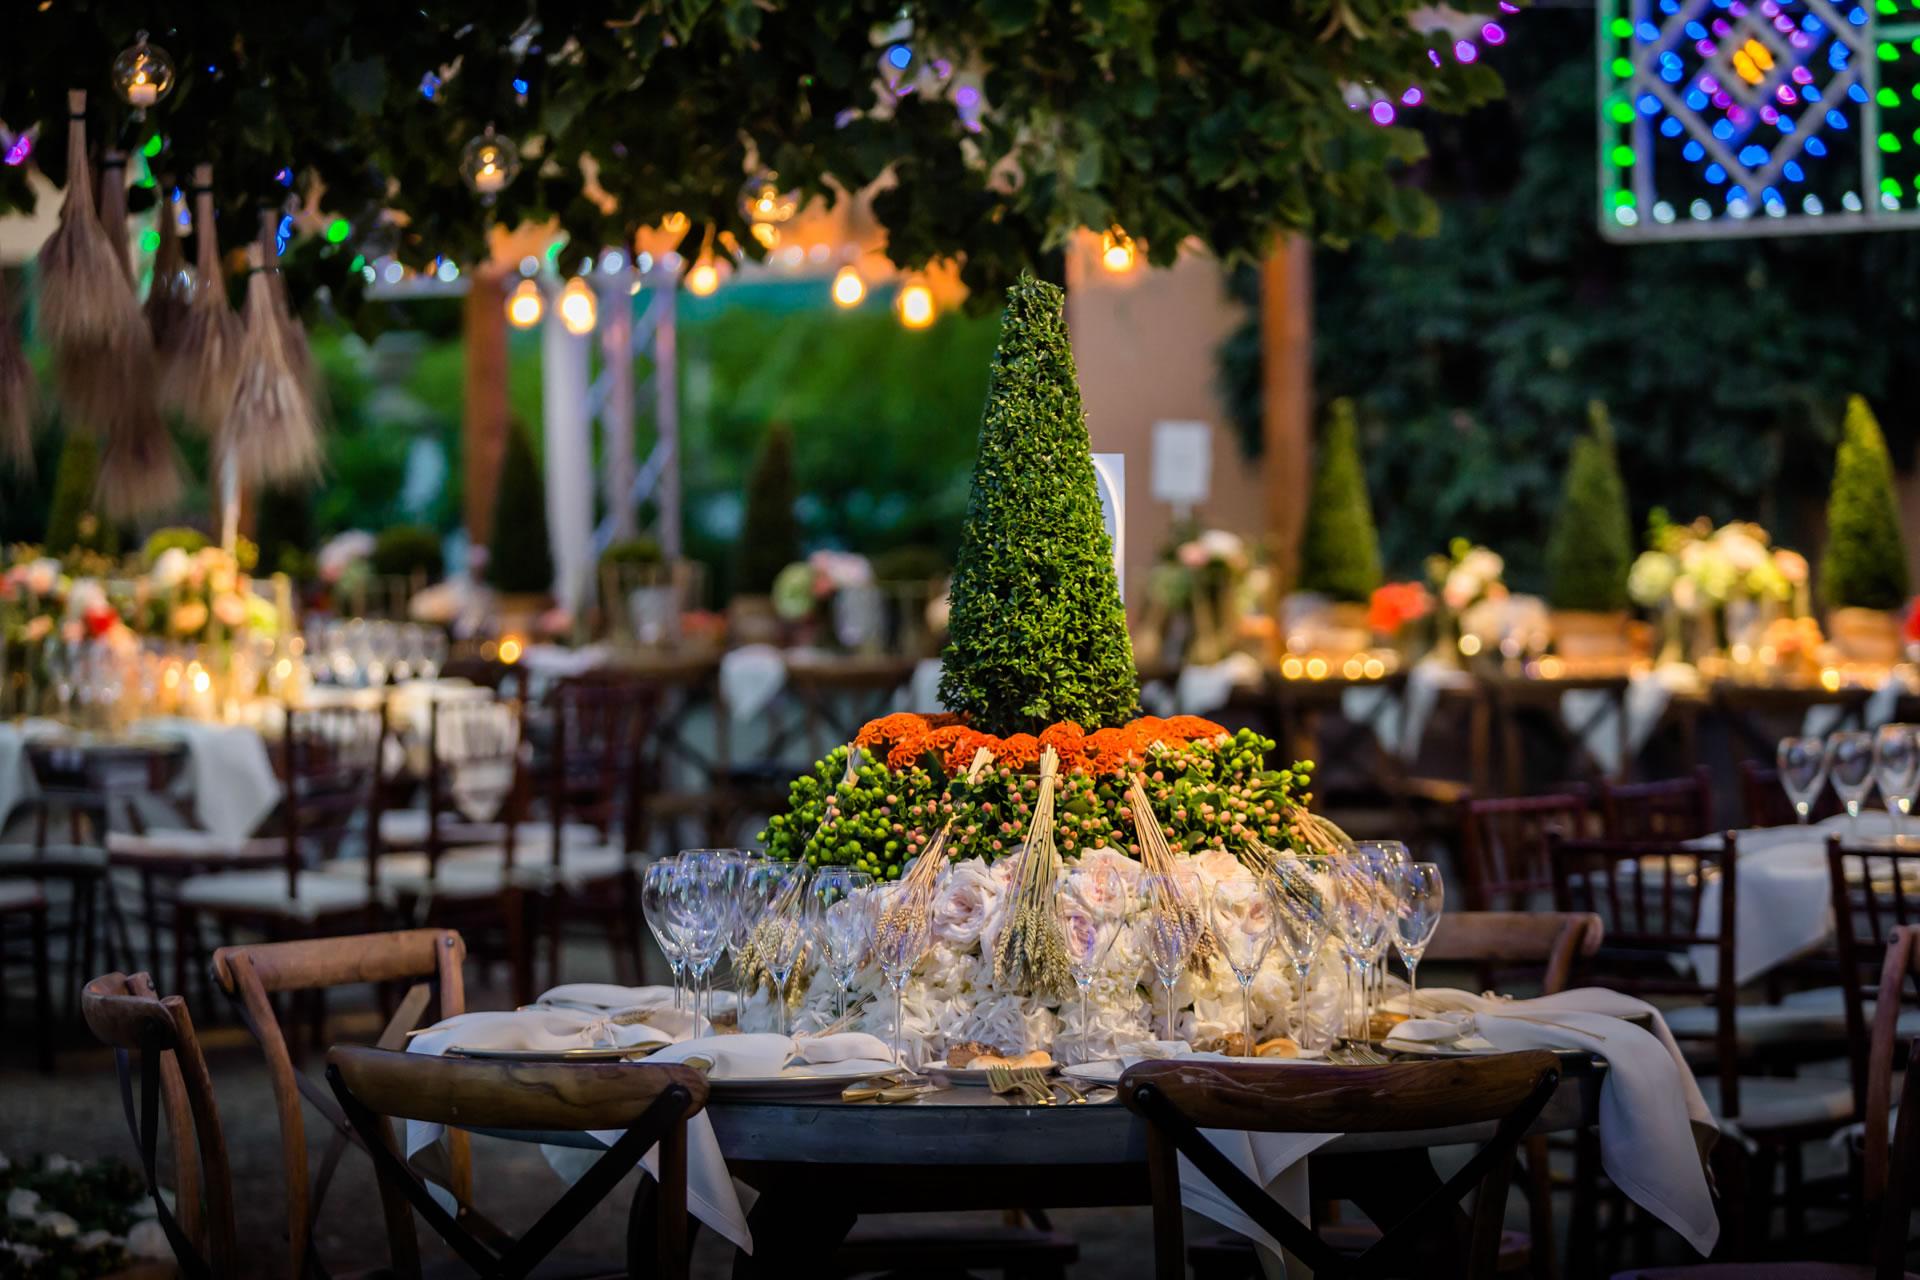 Trees - 57 :: Luxury wedding at Il Borro :: Luxury wedding photography - 56 :: Trees - 57